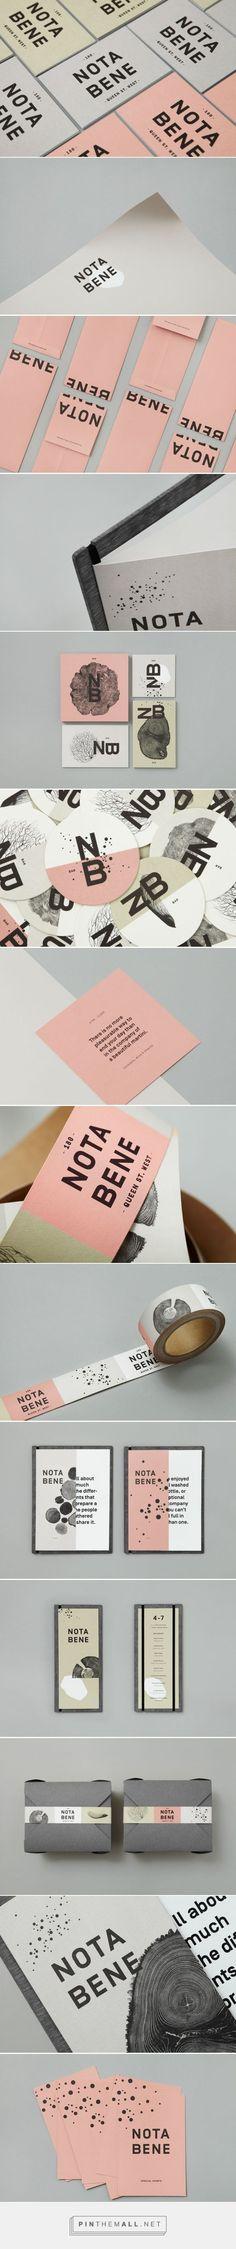 Nota Bene by Blok Design #graphicdesign #brandidentity #brandinginspiration